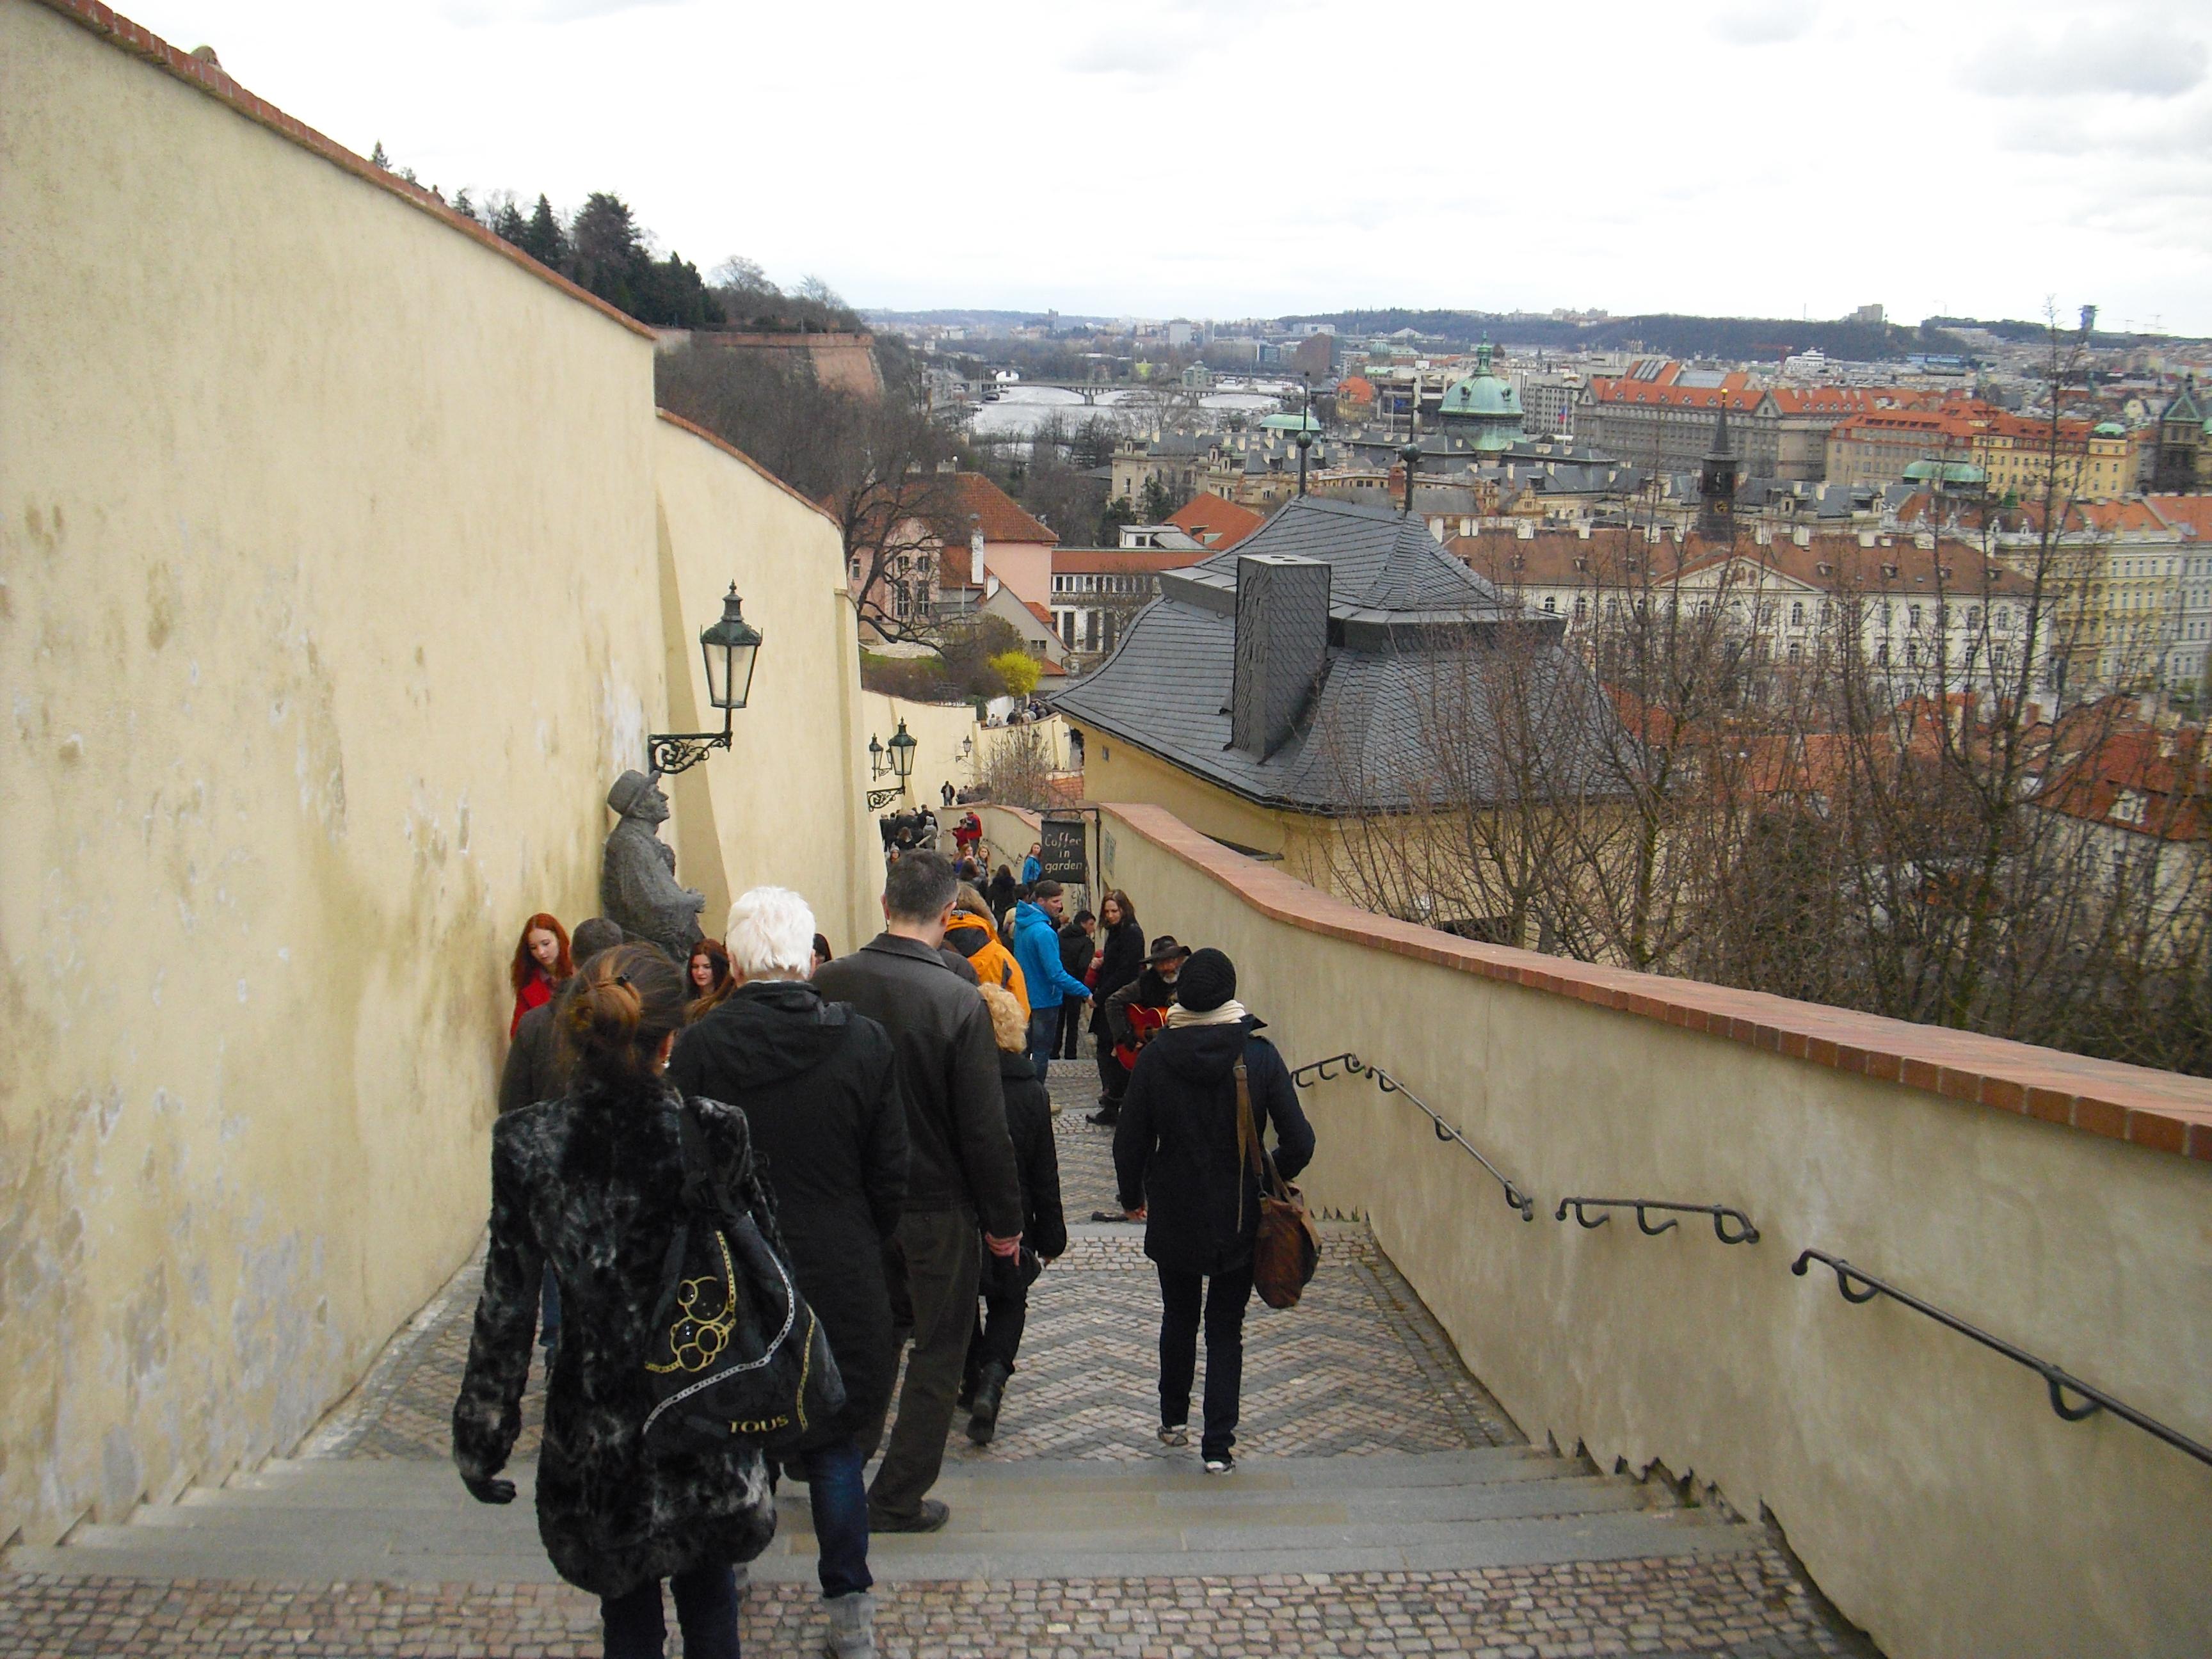 Las calles de Praga narran leyendas olvidadas...